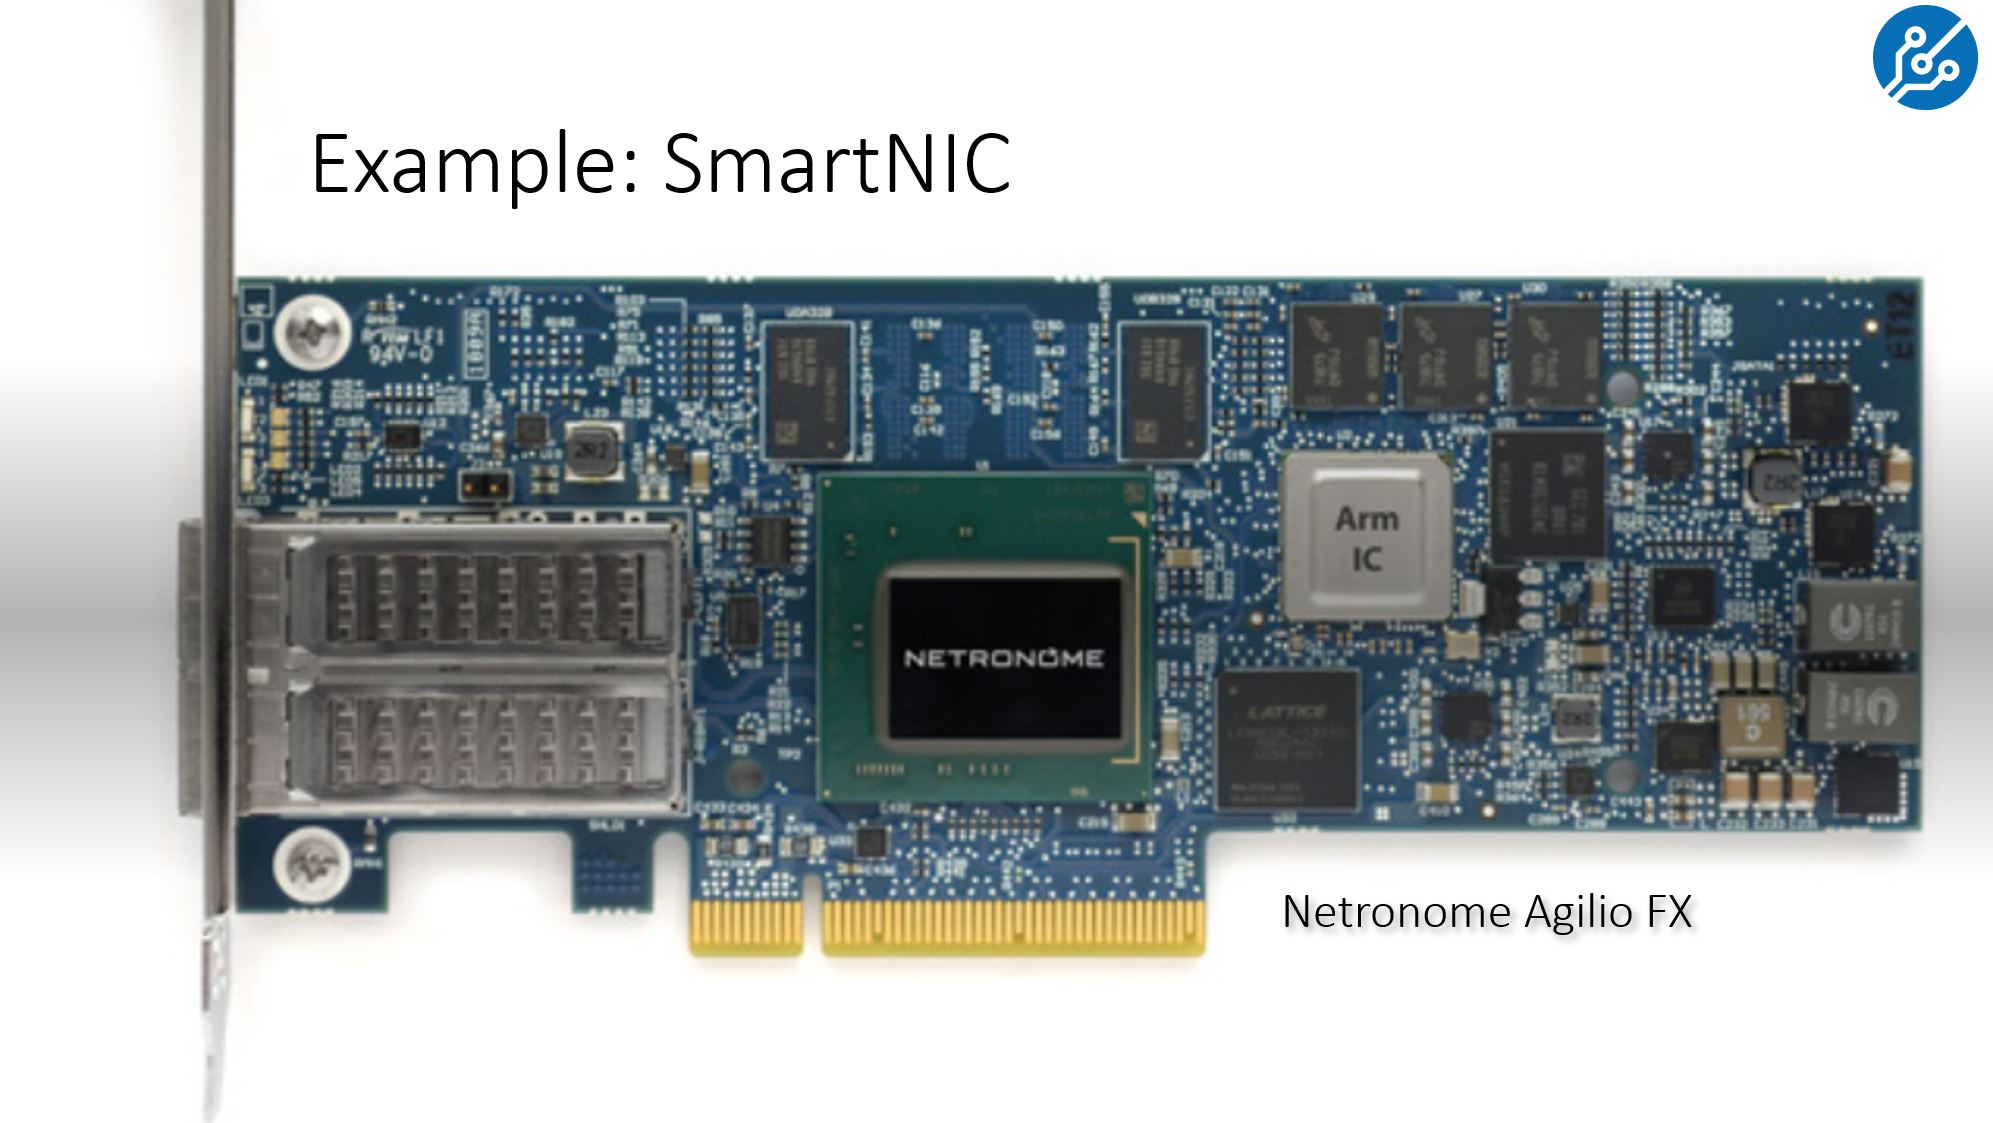 SmartNIC Example Q2 2021